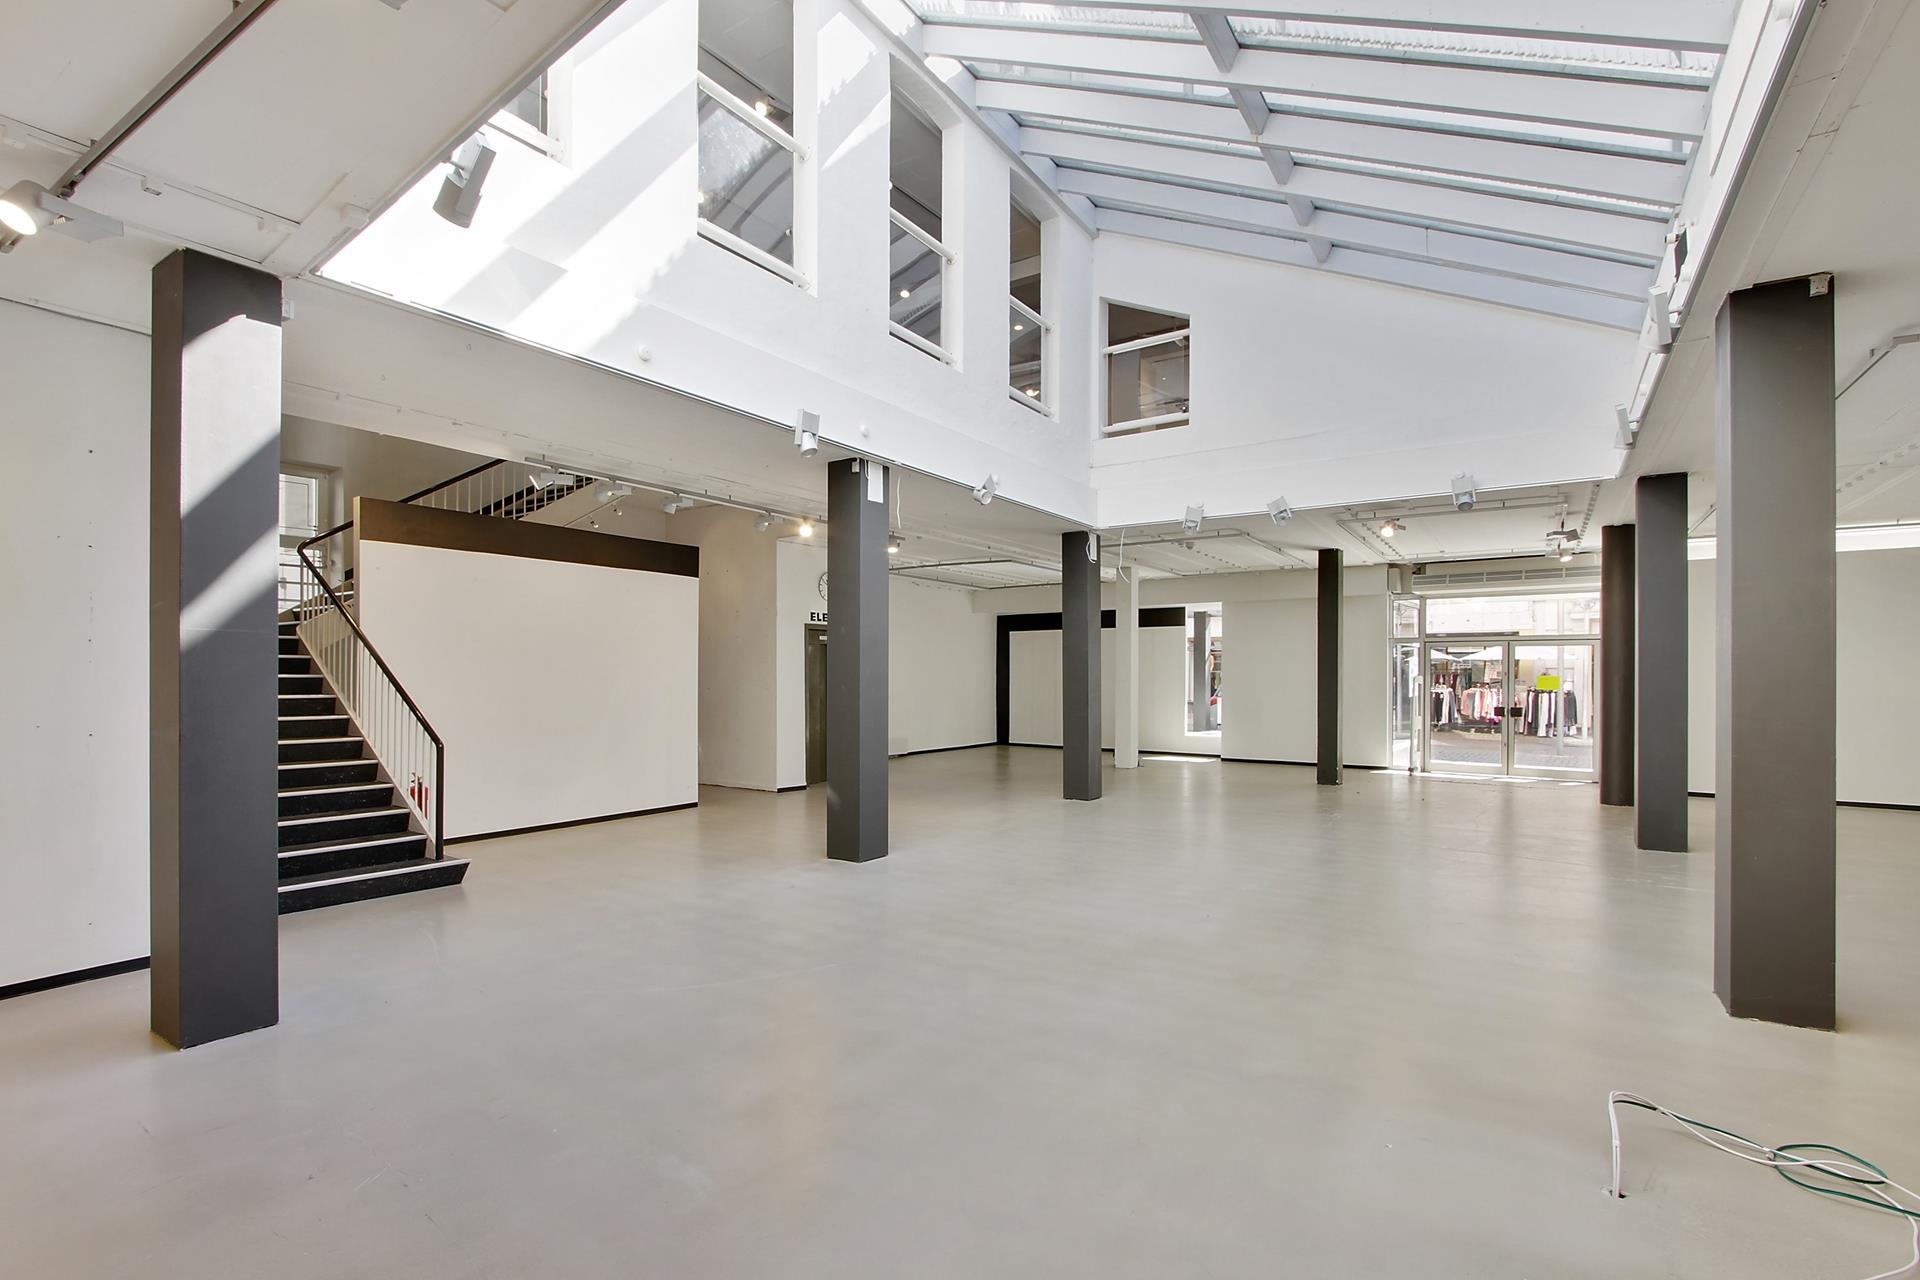 Bolig/erhverv på Torvegade i Randers C - Butikslokale